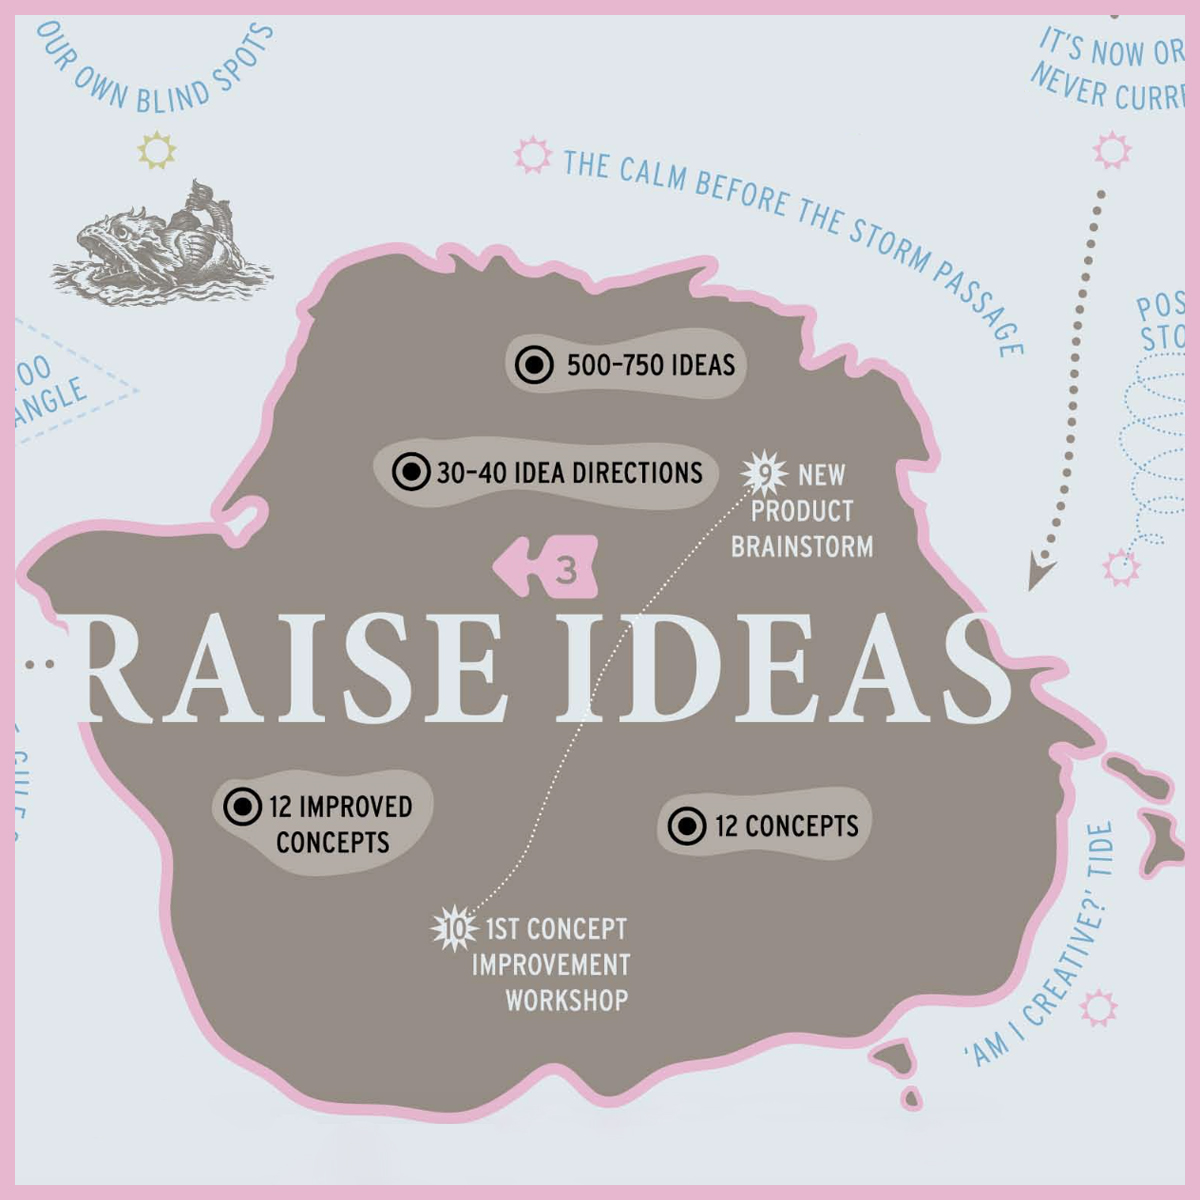 FORTH Innovation - Raise Ideas